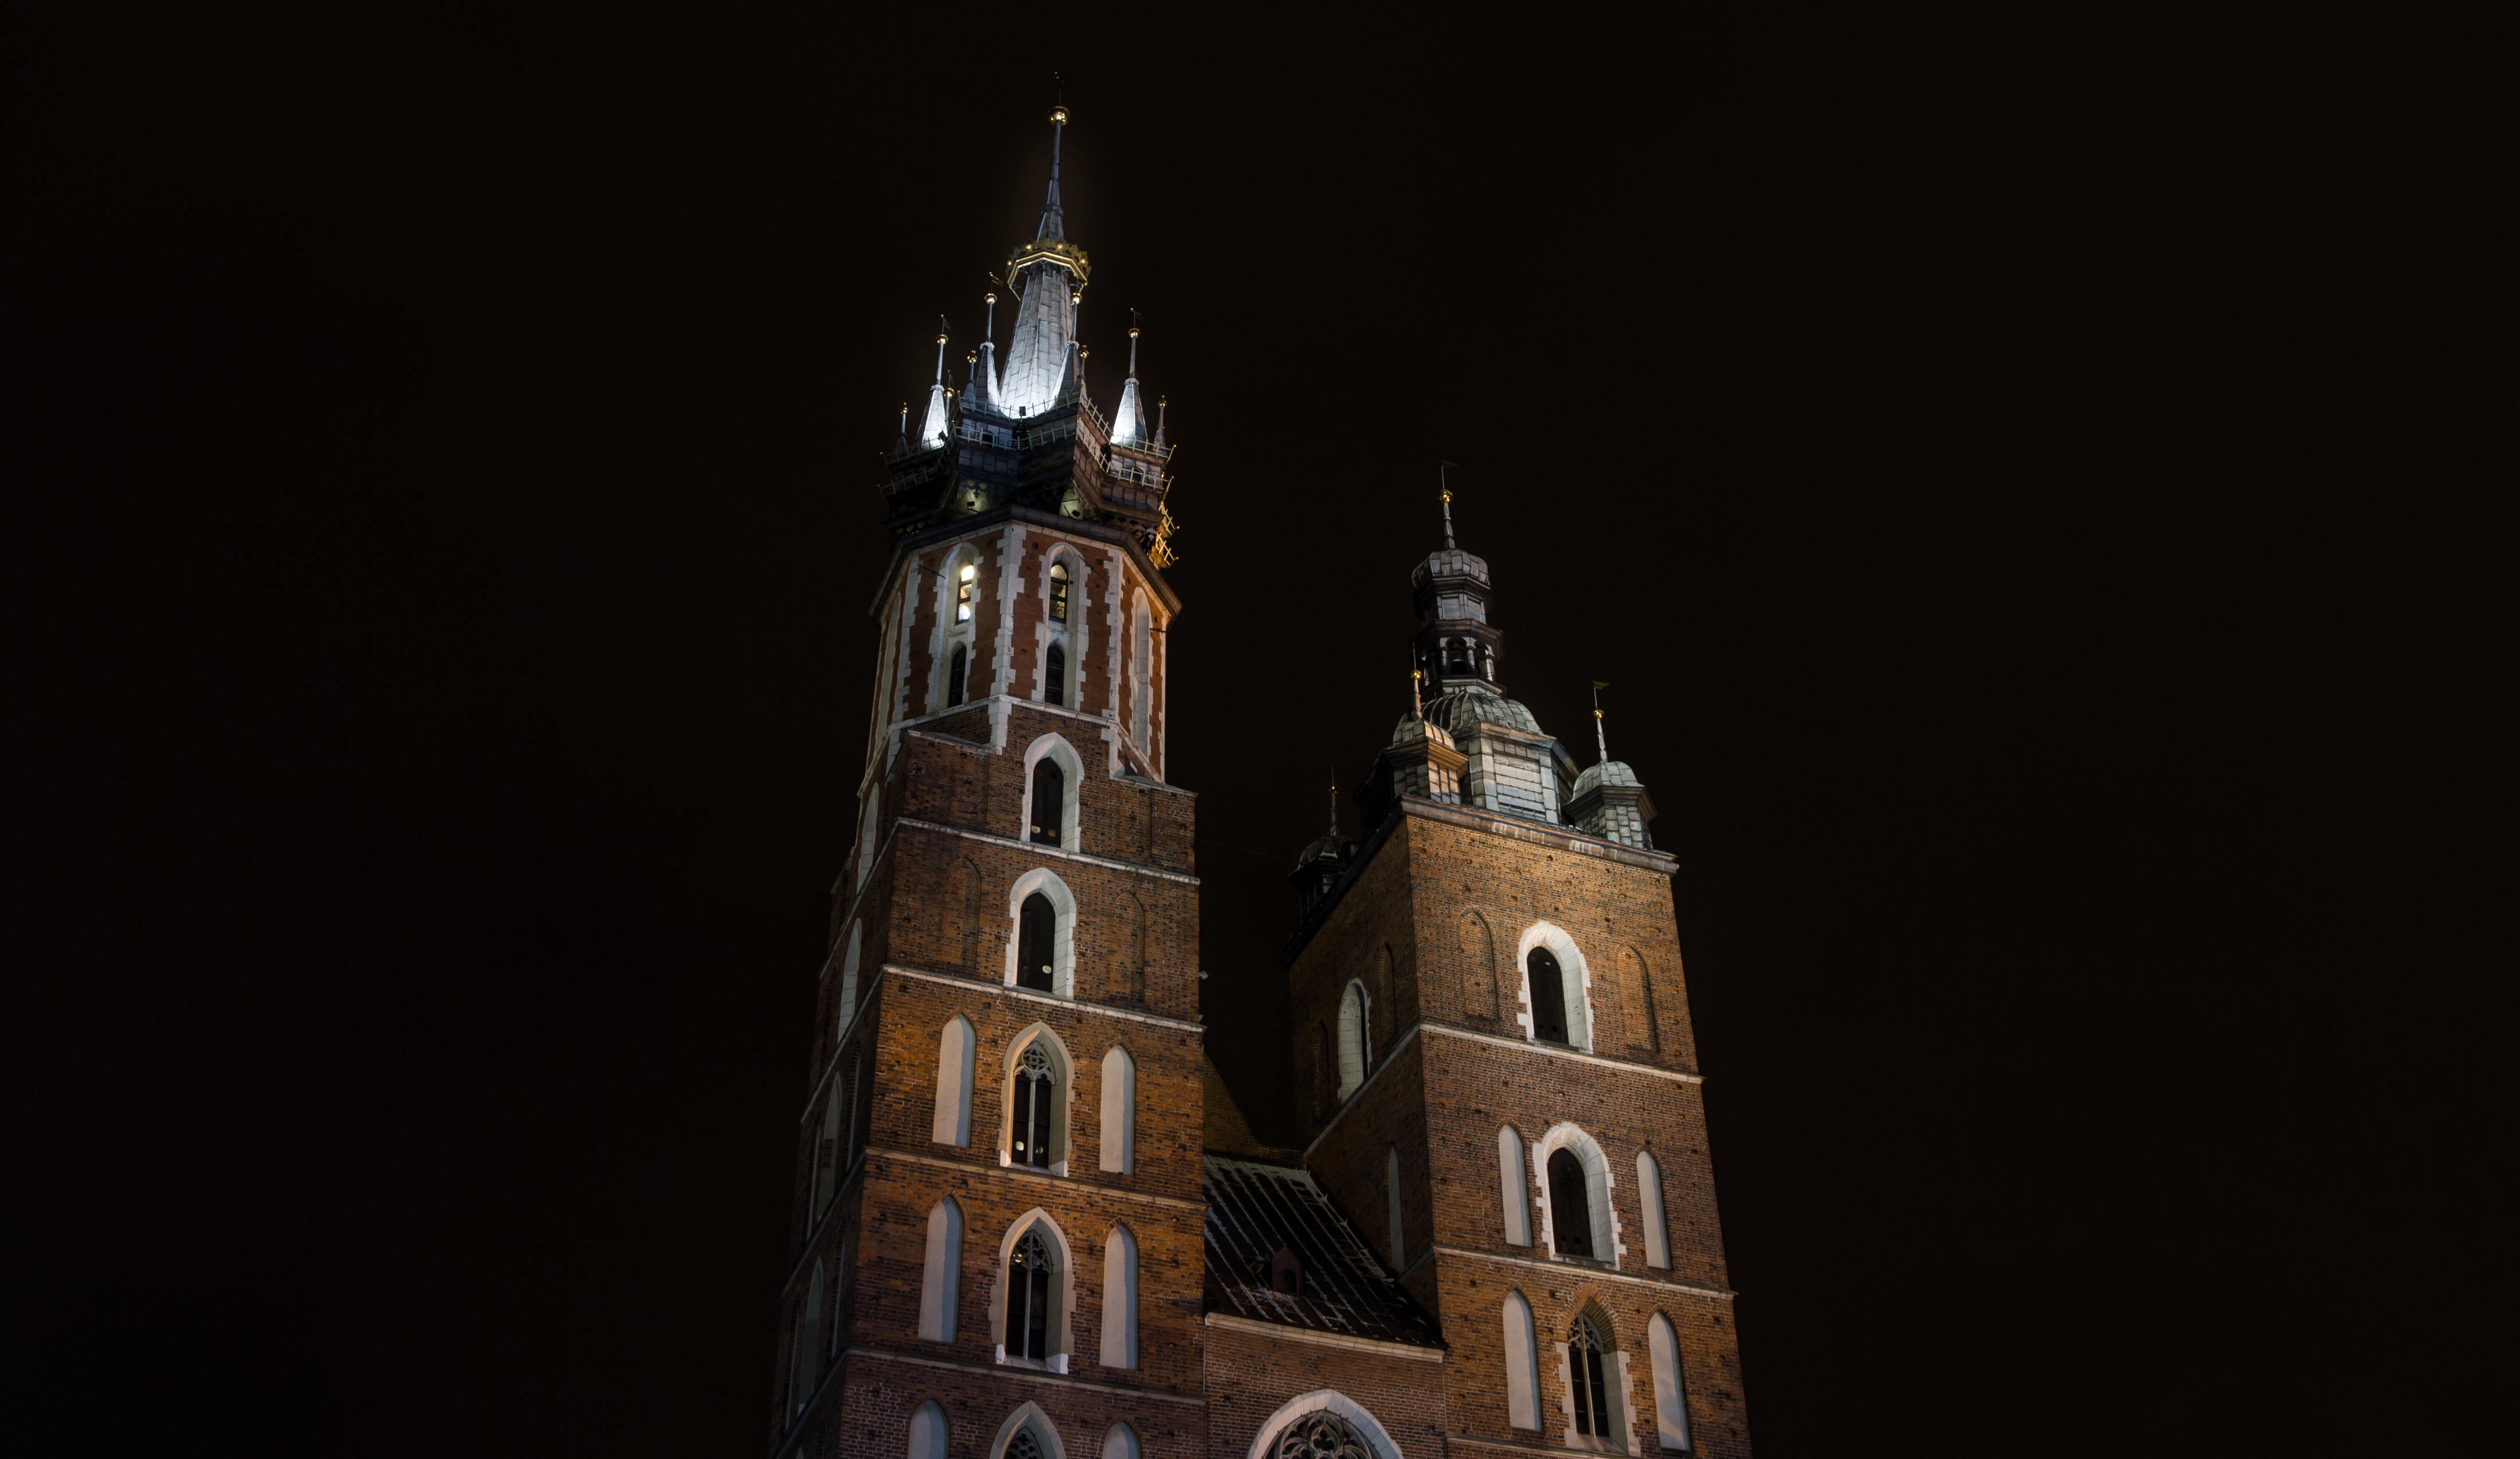 St mary's basilica (kościół mariacki), krakow, poland photo